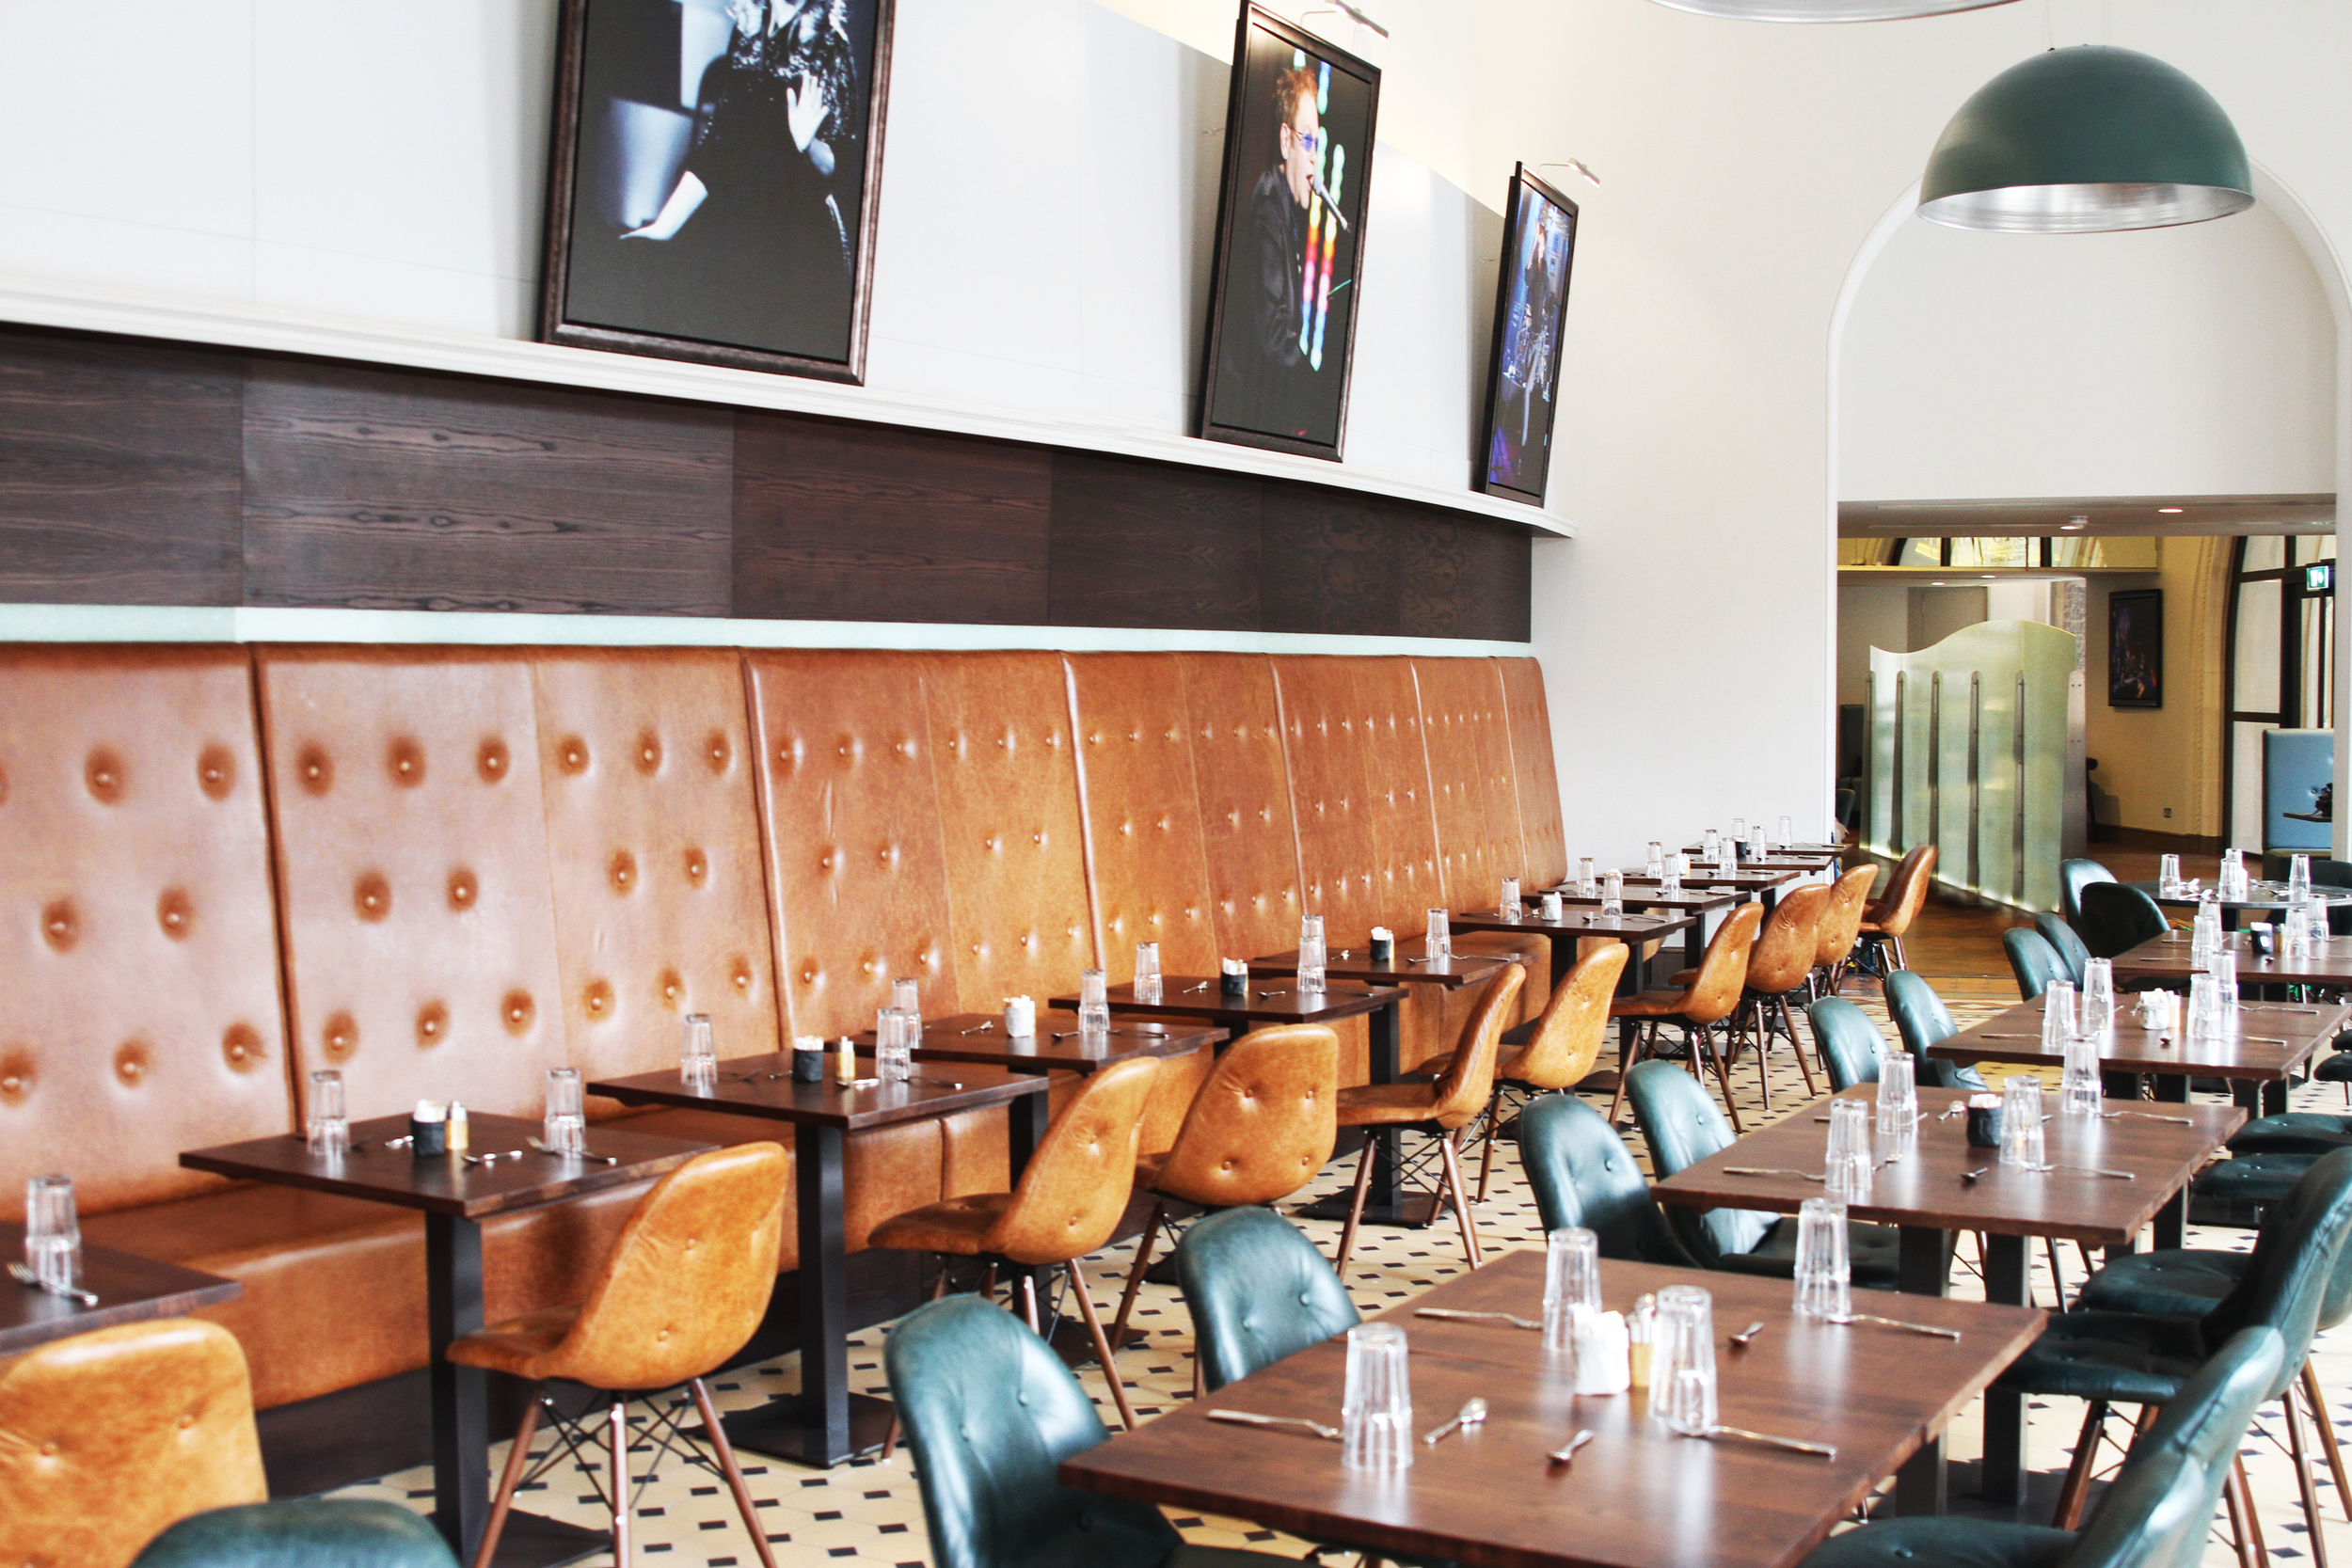 Verdi Restaurant in Royal Albert Hall serves Afternoon Tea